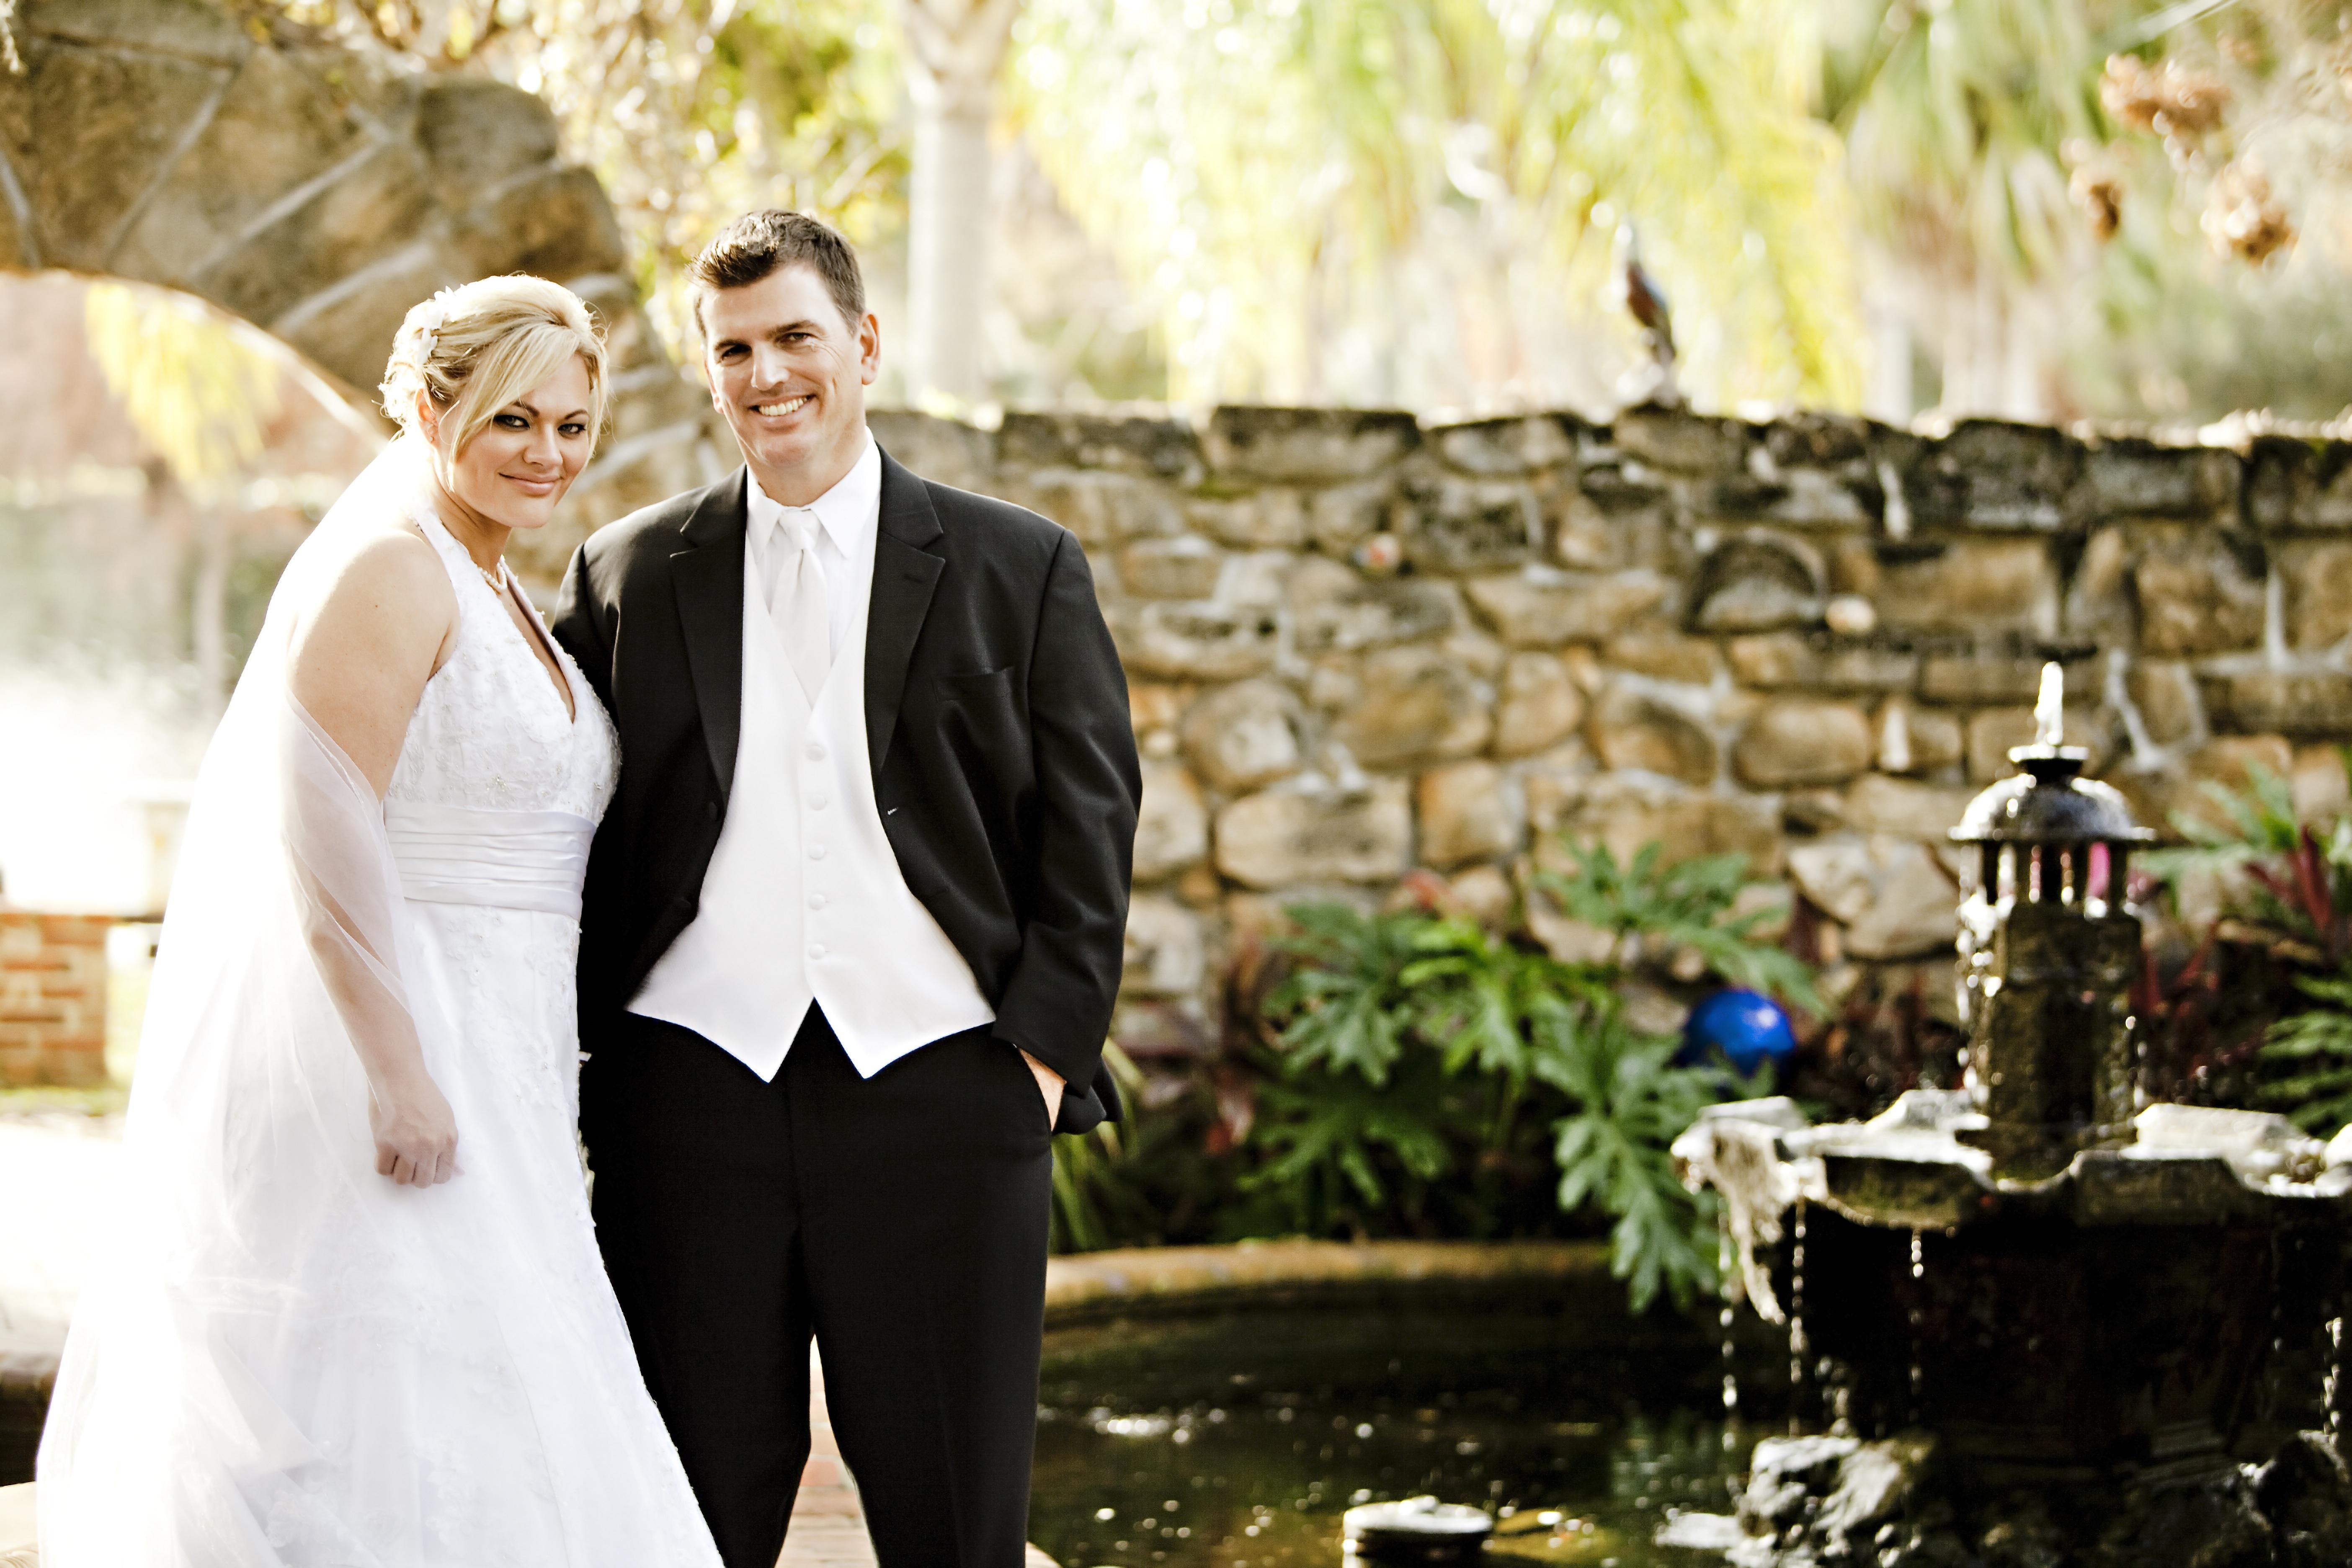 Husband and wife por-1030